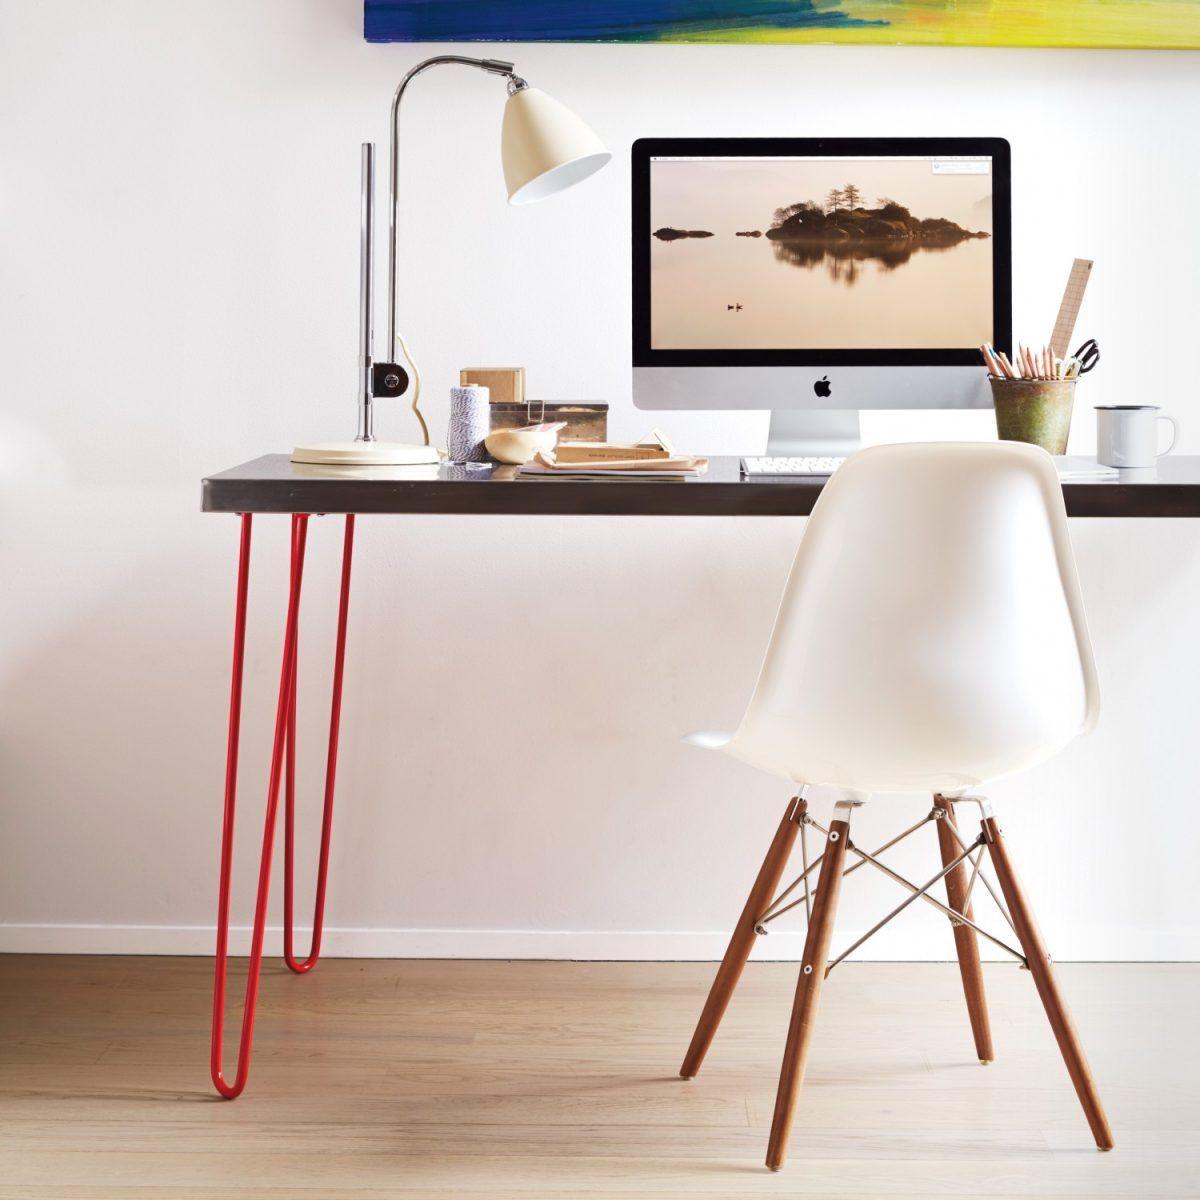 ikea console bureau perfect desk simple stand up desks ikea rectangle shape white finish top. Black Bedroom Furniture Sets. Home Design Ideas